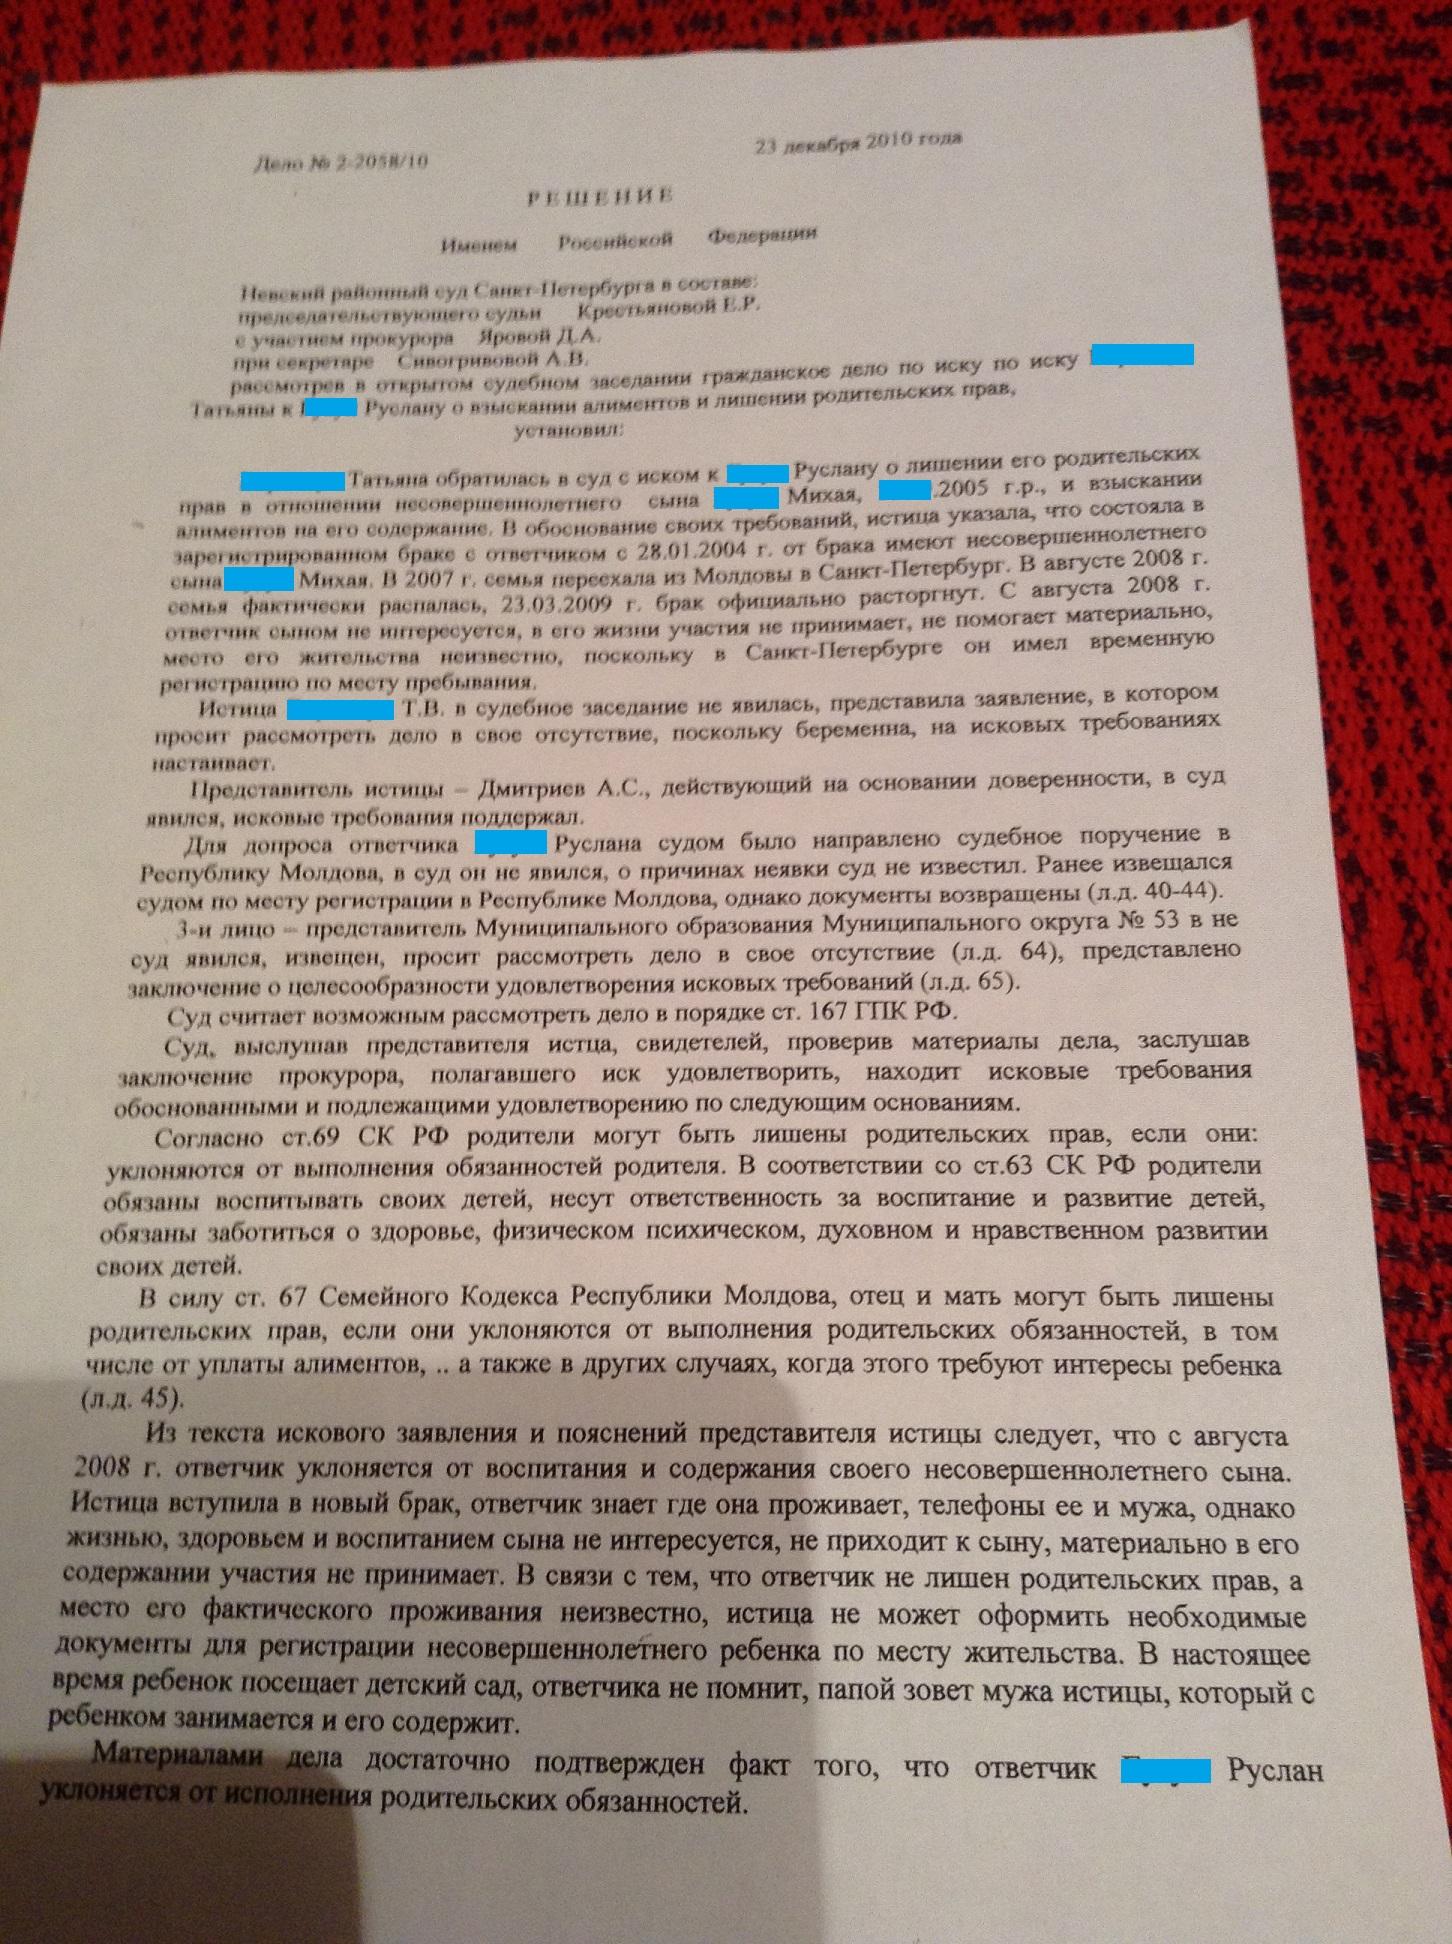 видели характеристика в суд по лишению прав образец глава делегации